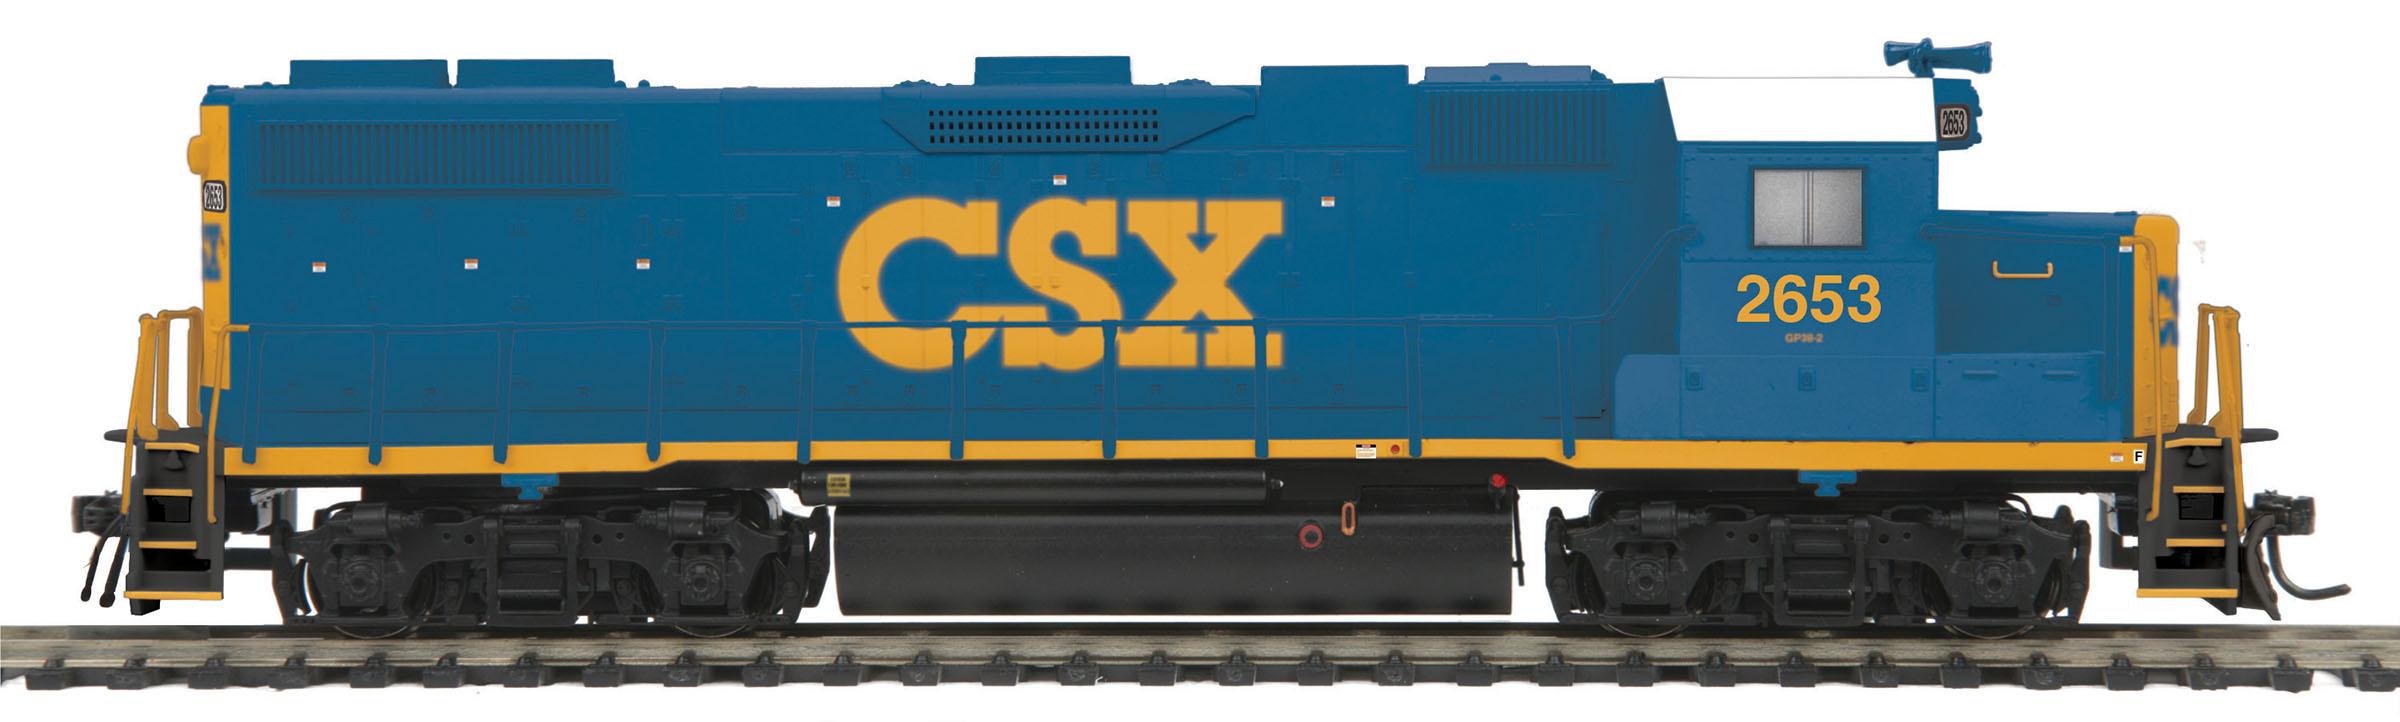 MTH 85-2056-1 EMD GP38 2 Proto Sound 3.0 & DCC CSX 2653